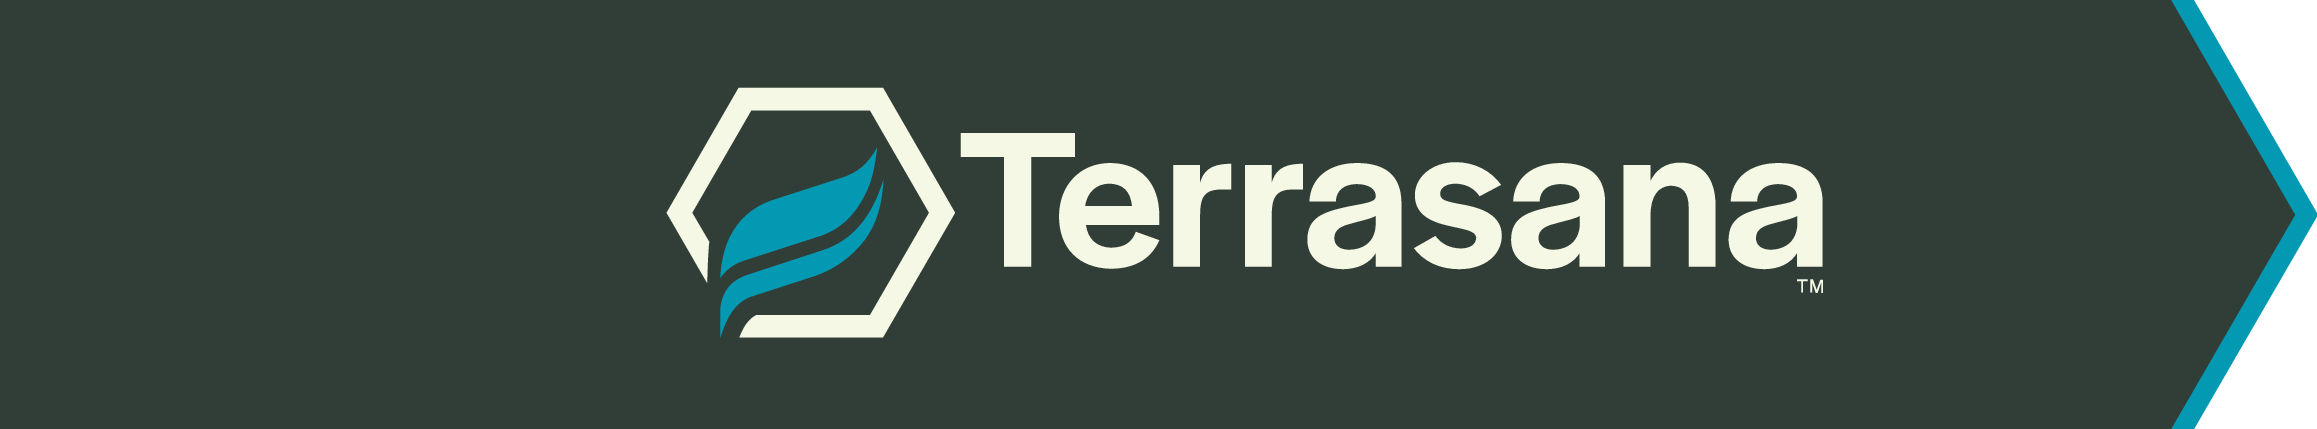 Terrasana Logo 1 1